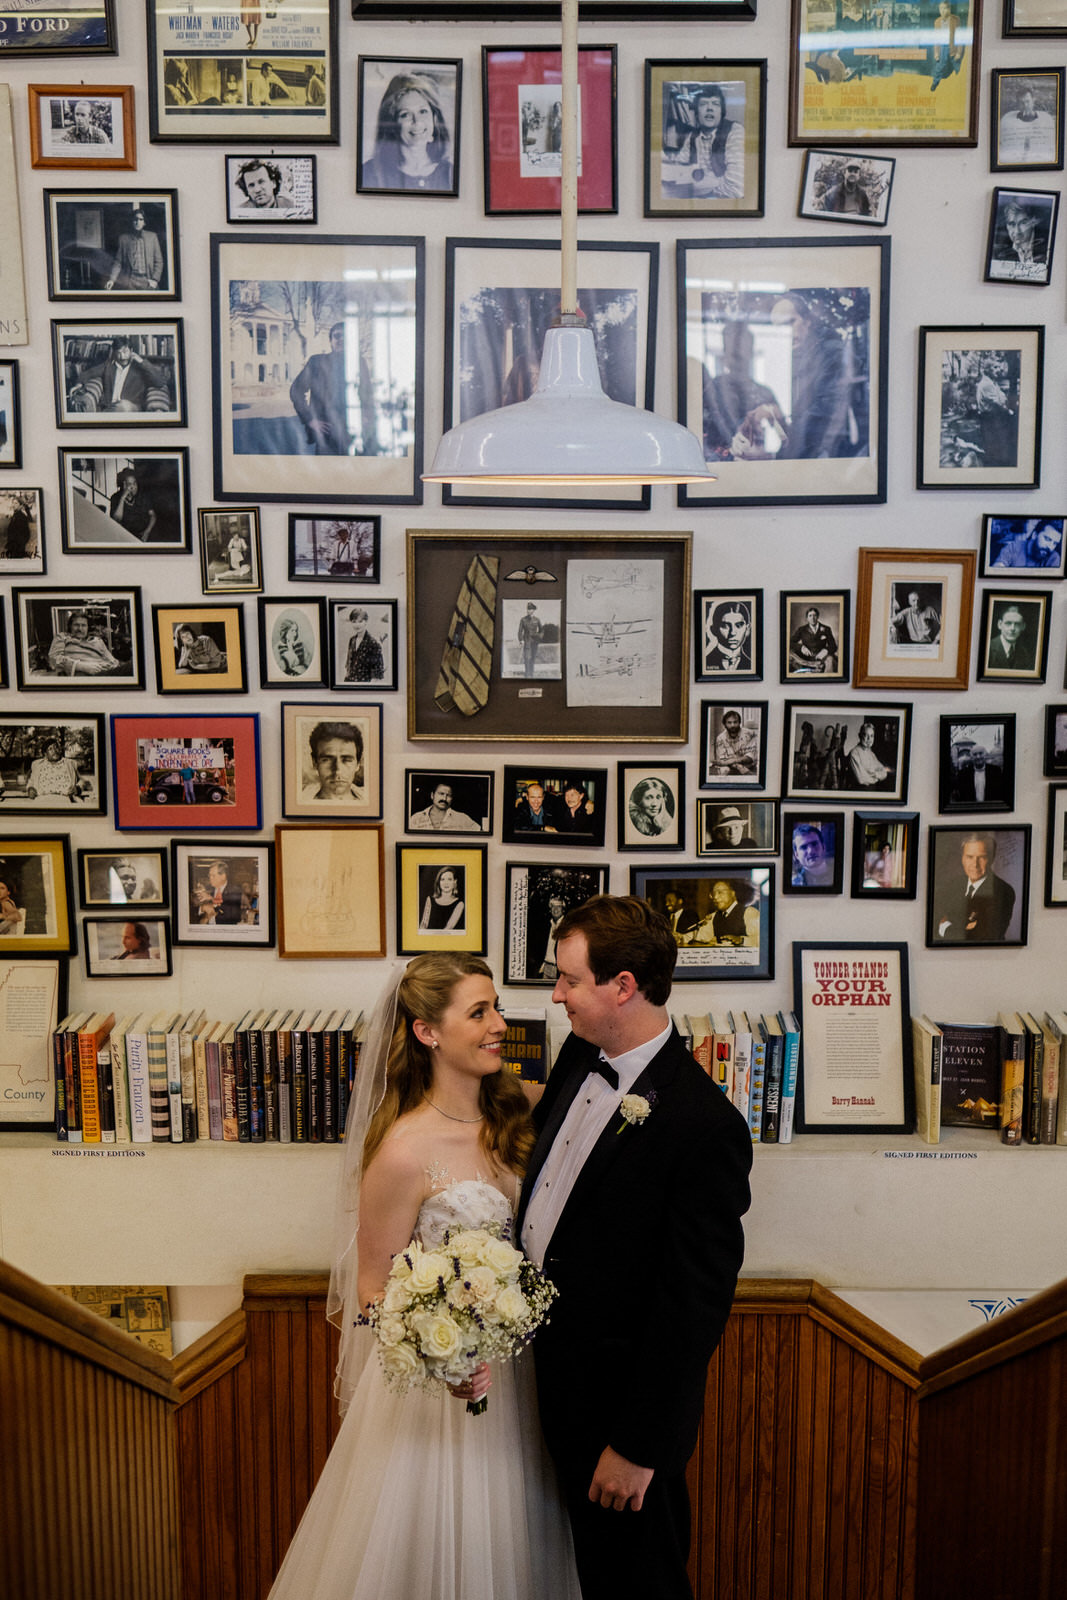 Oxford_Mississippi_wedding_photographer_25.JPG